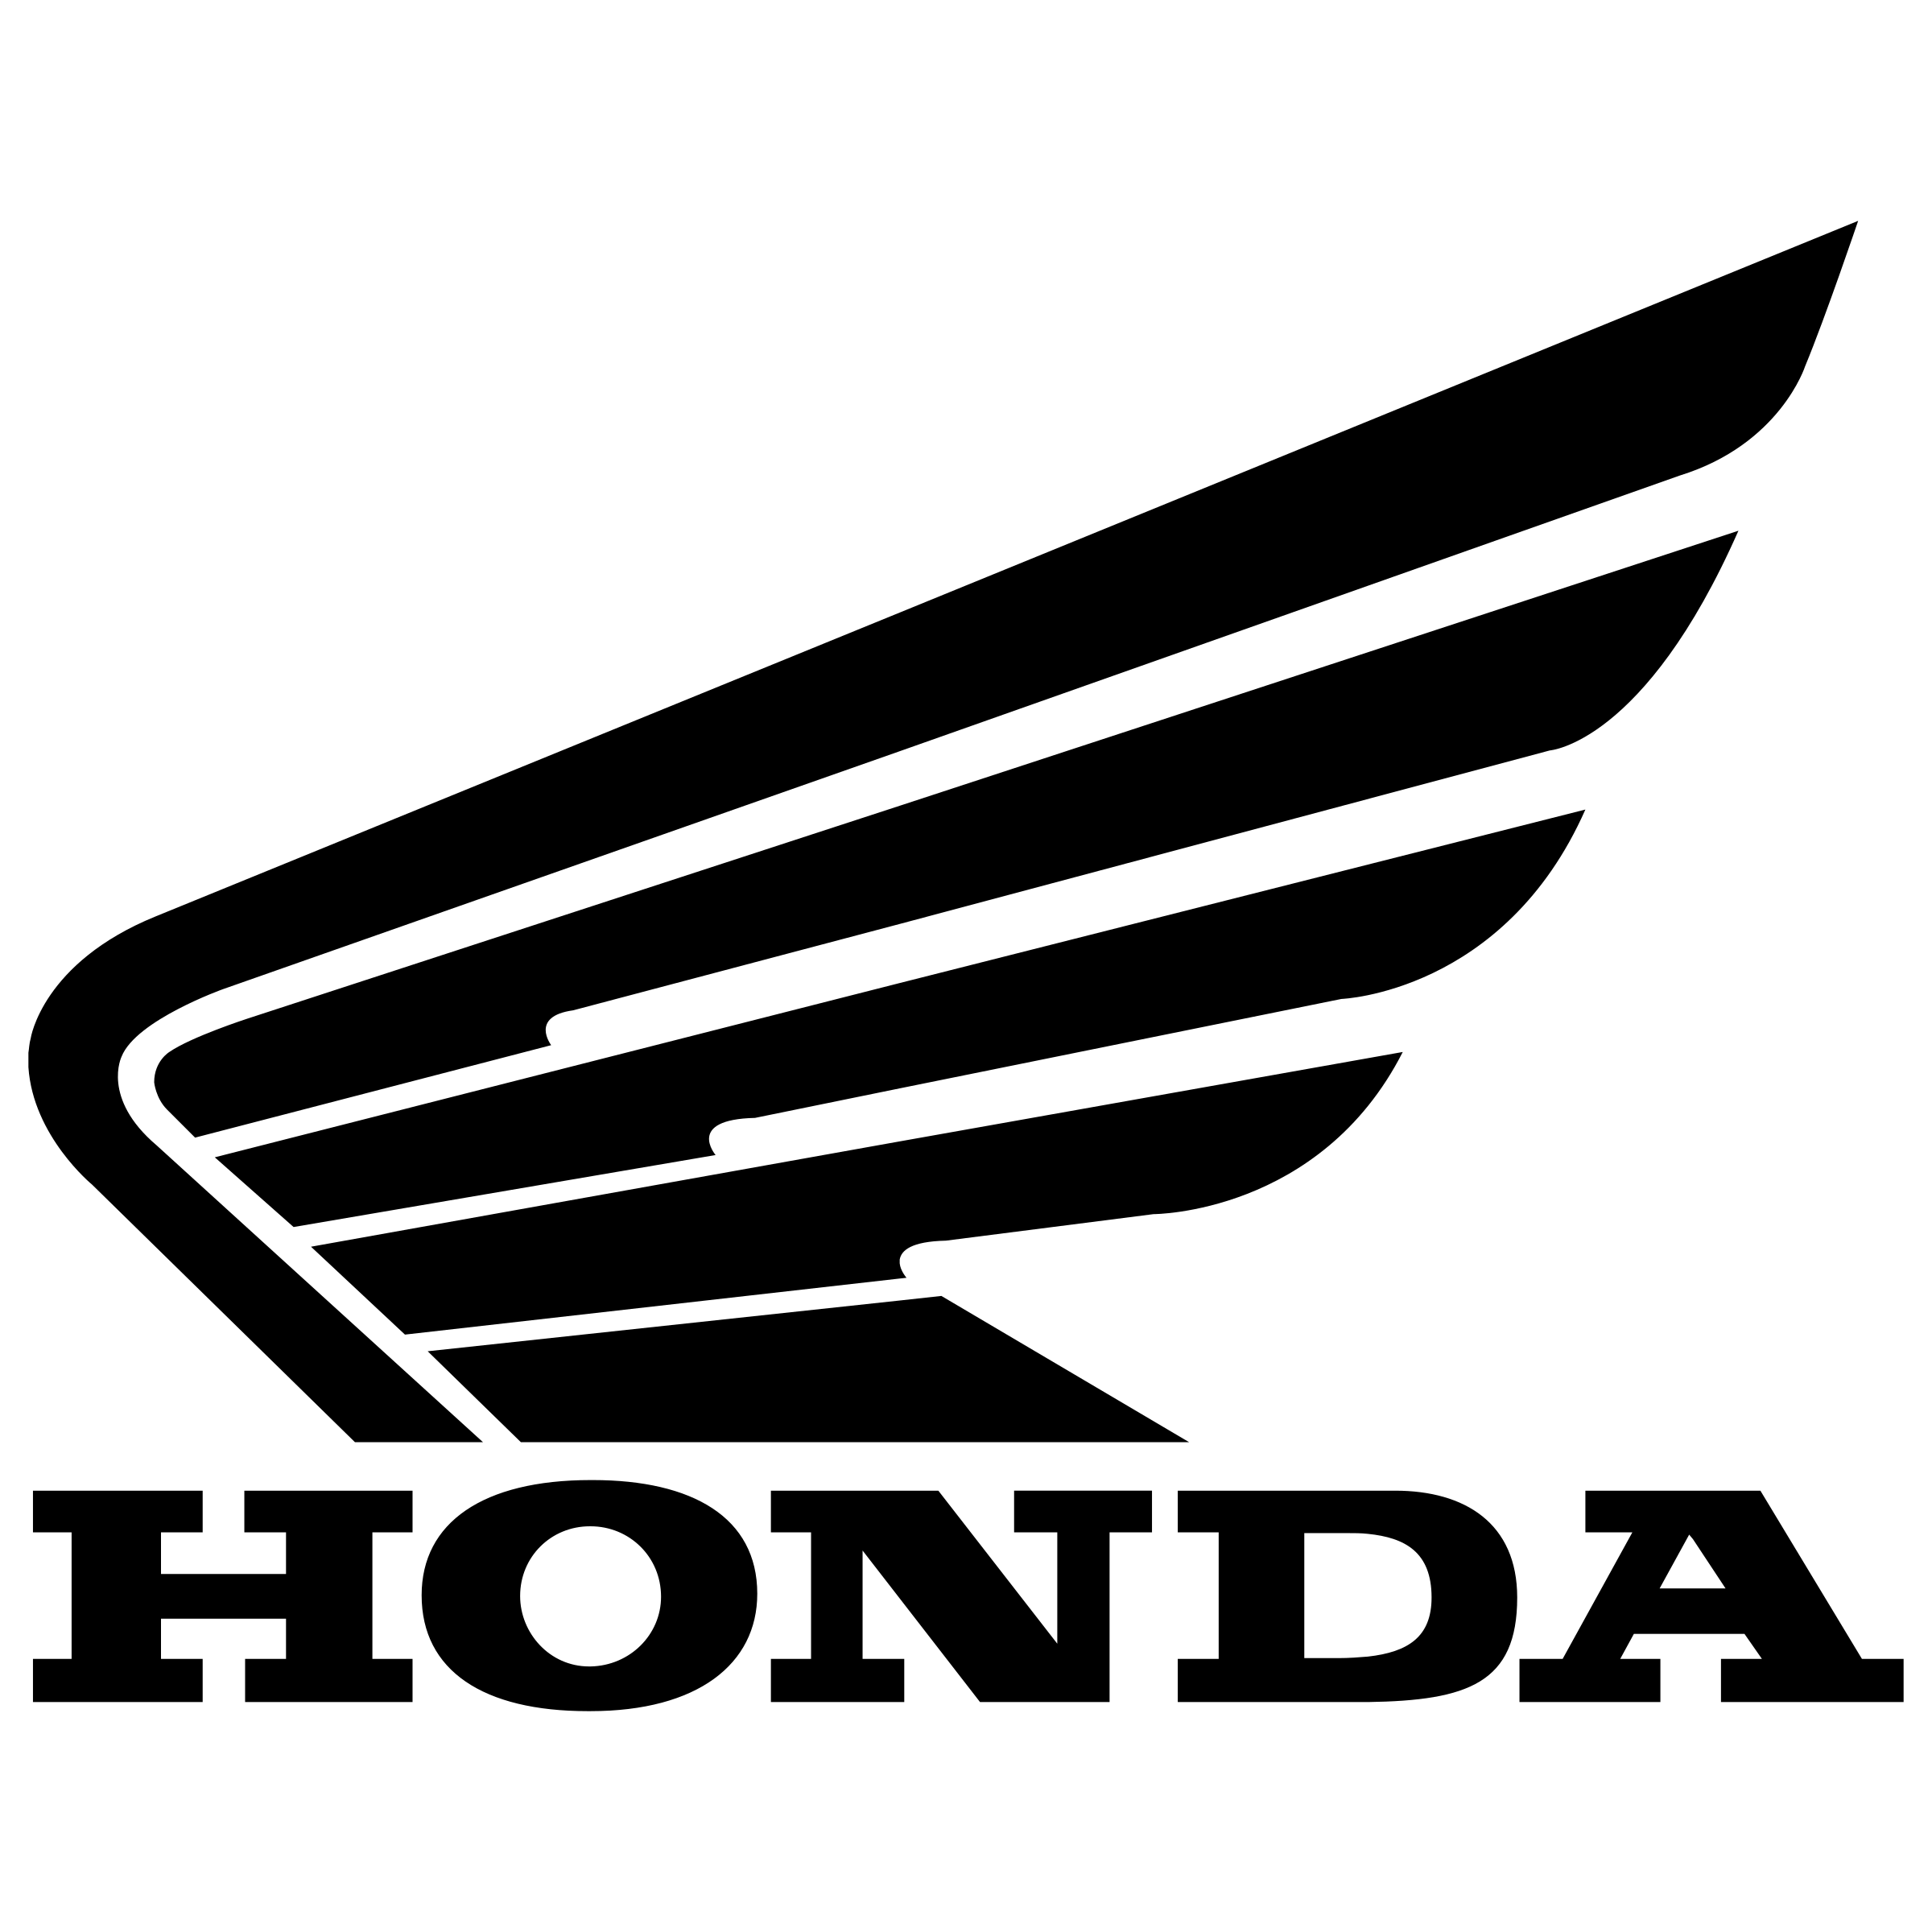 honda logo png transparent svg vector freebie supply rh freebiesupply com honda logo vector png honda logo vector motorcycle